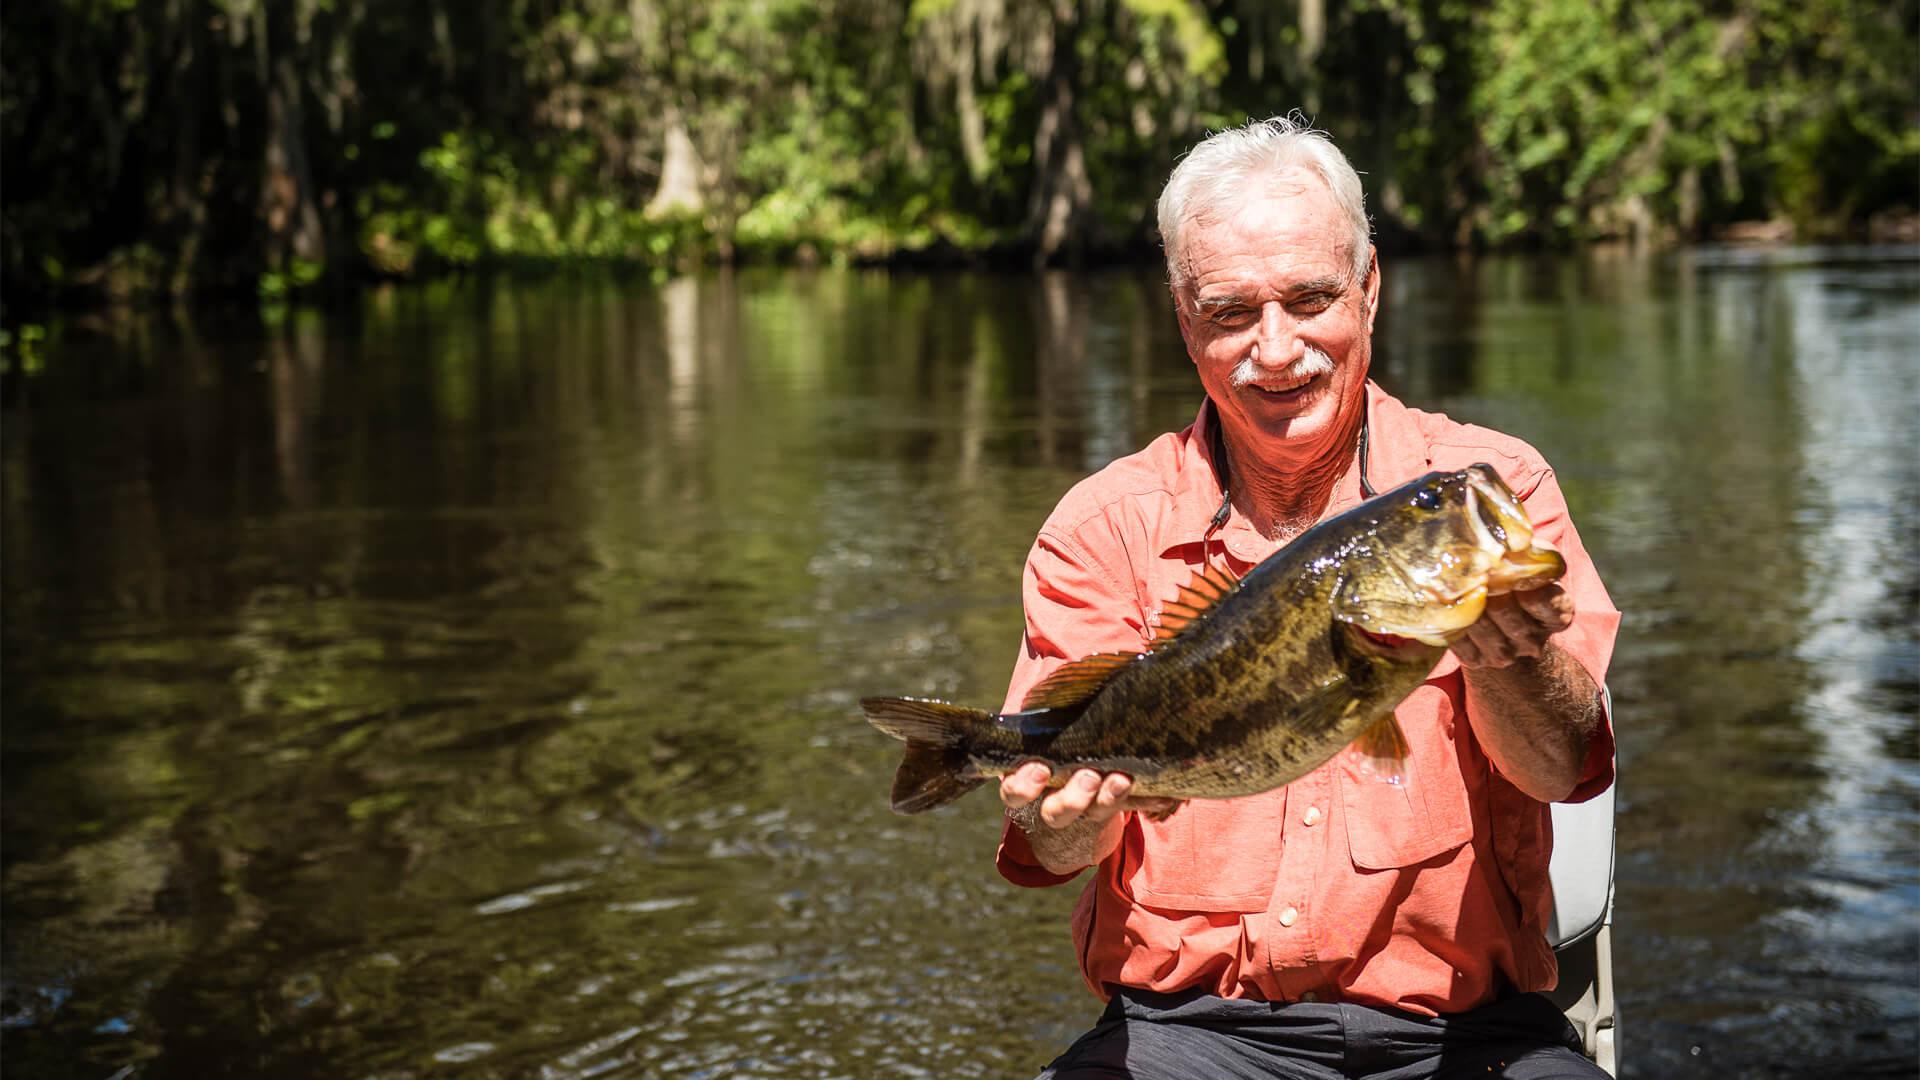 Fishing Boating Visit Sebring Florida